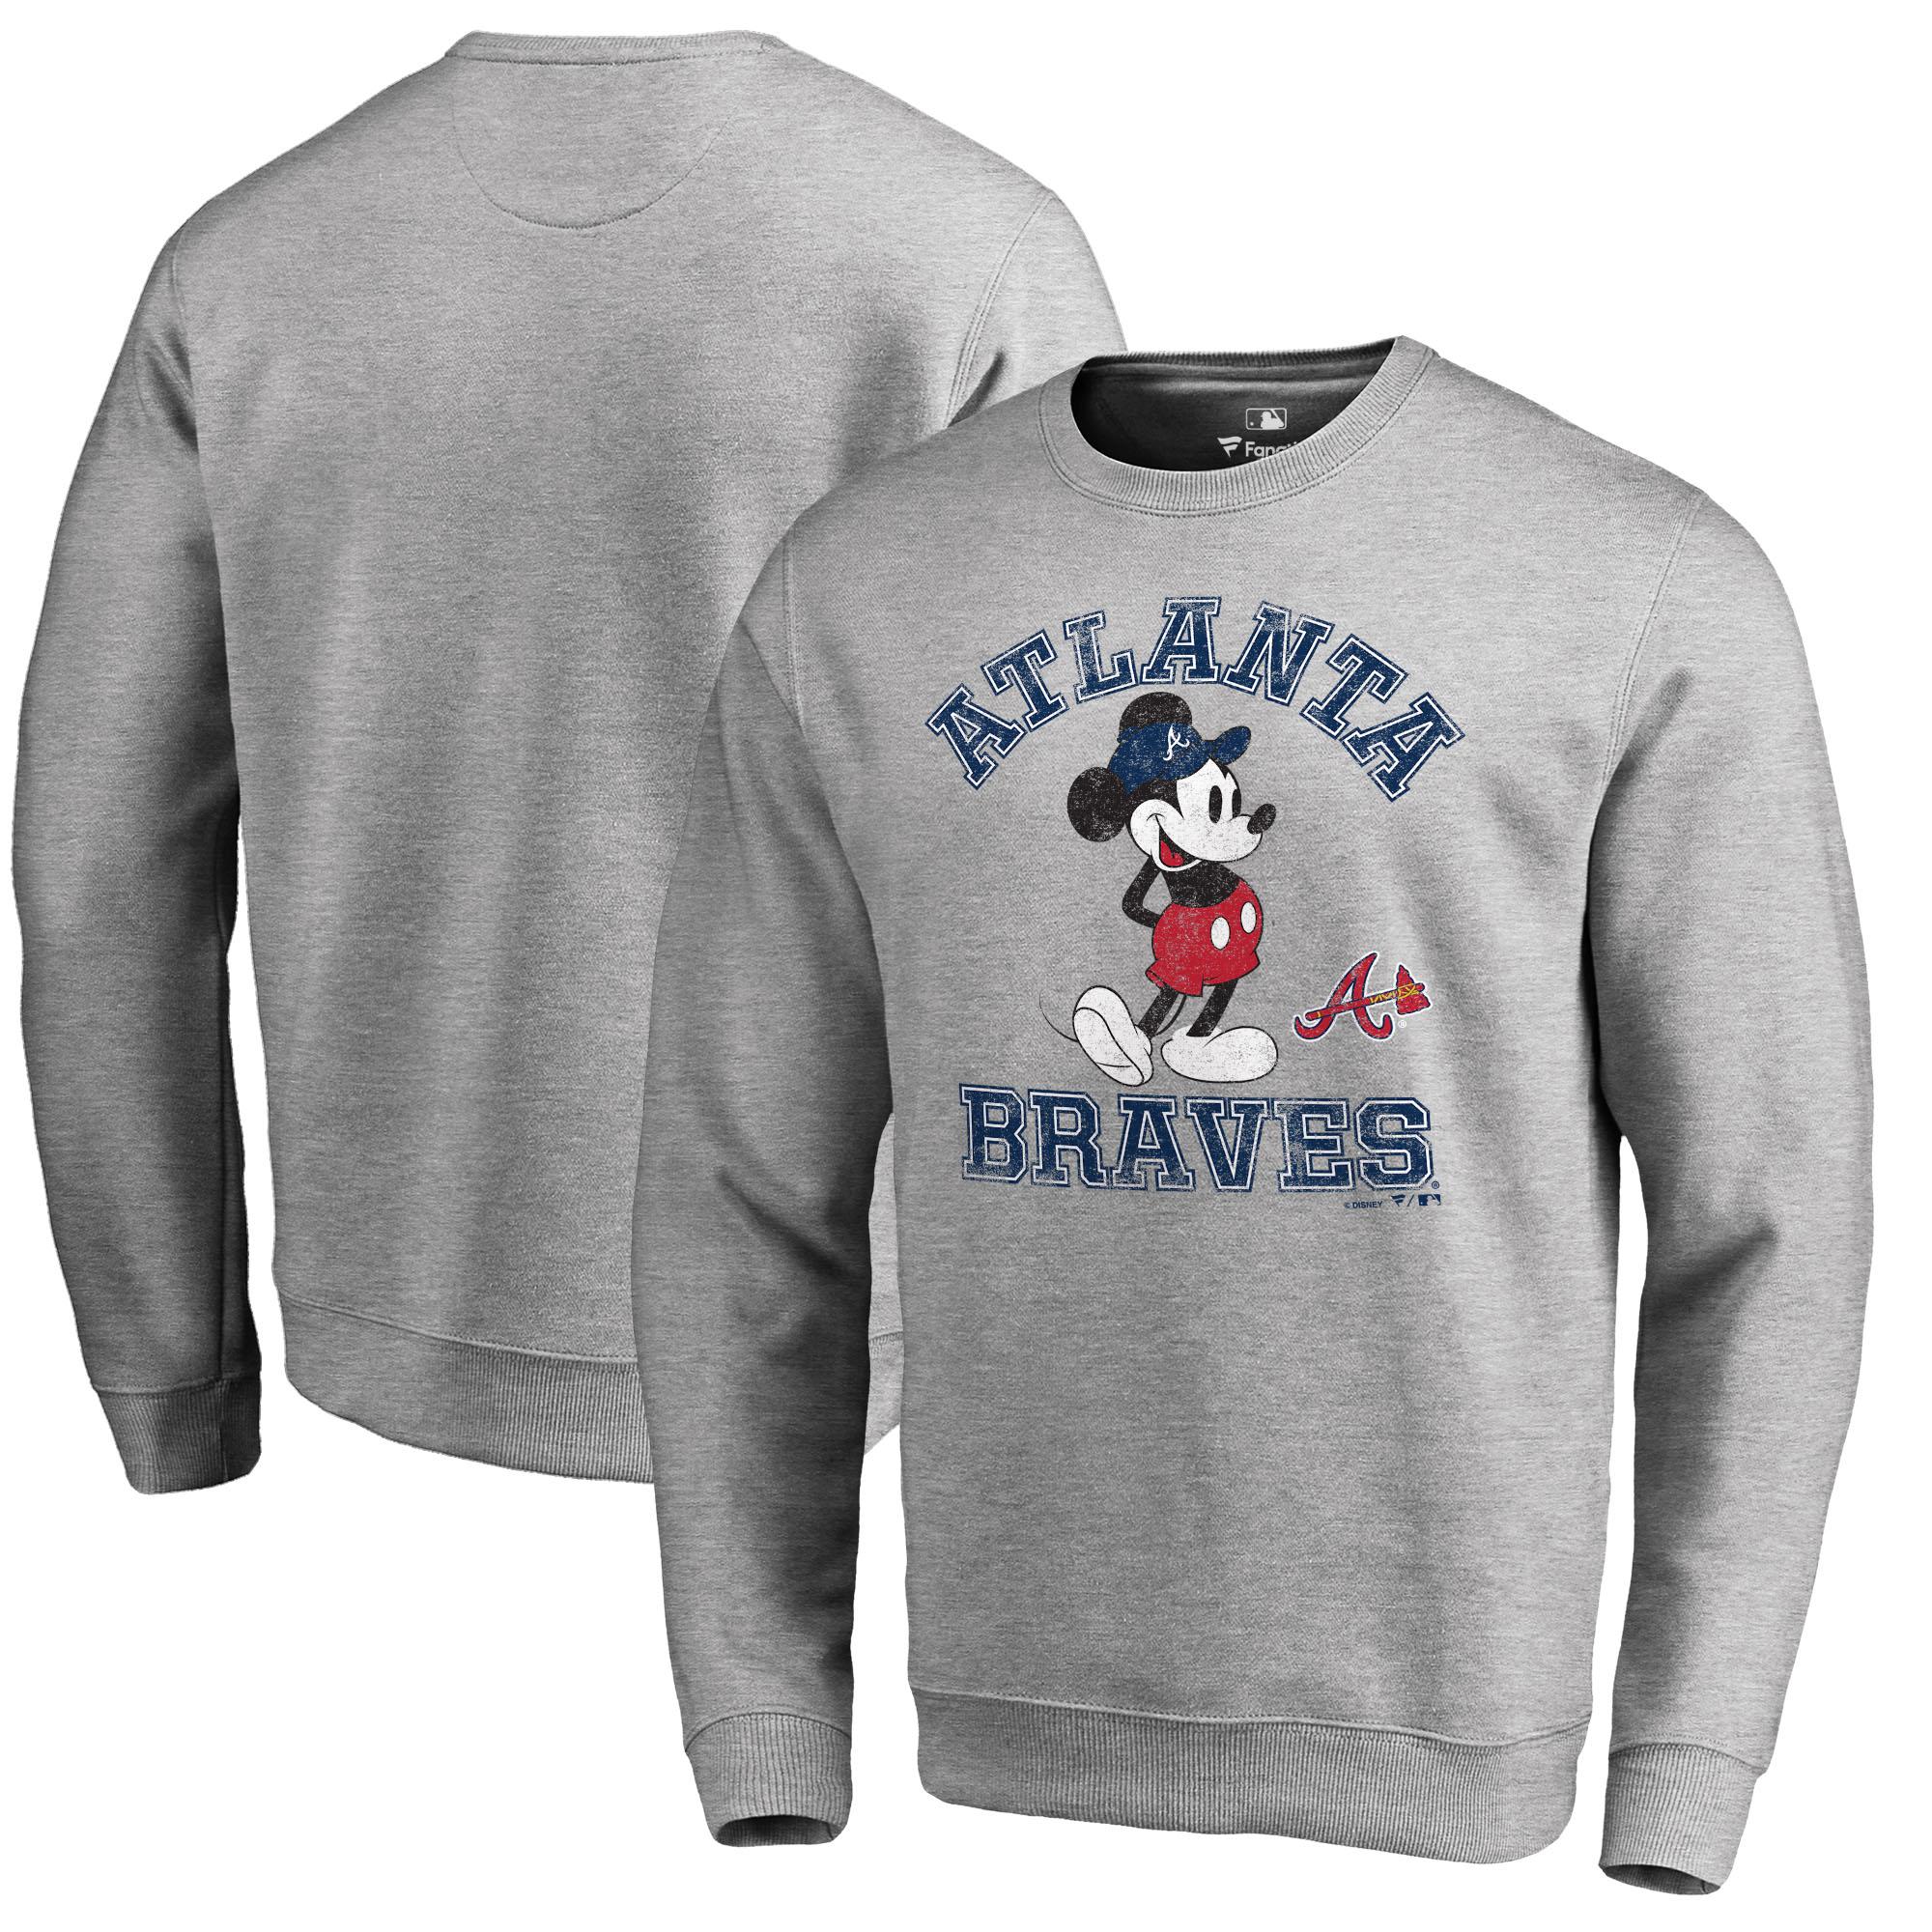 Atlanta Braves Fanatics Branded Disney MLB Tradition Pullover Sweatshirt - Heathered Gray